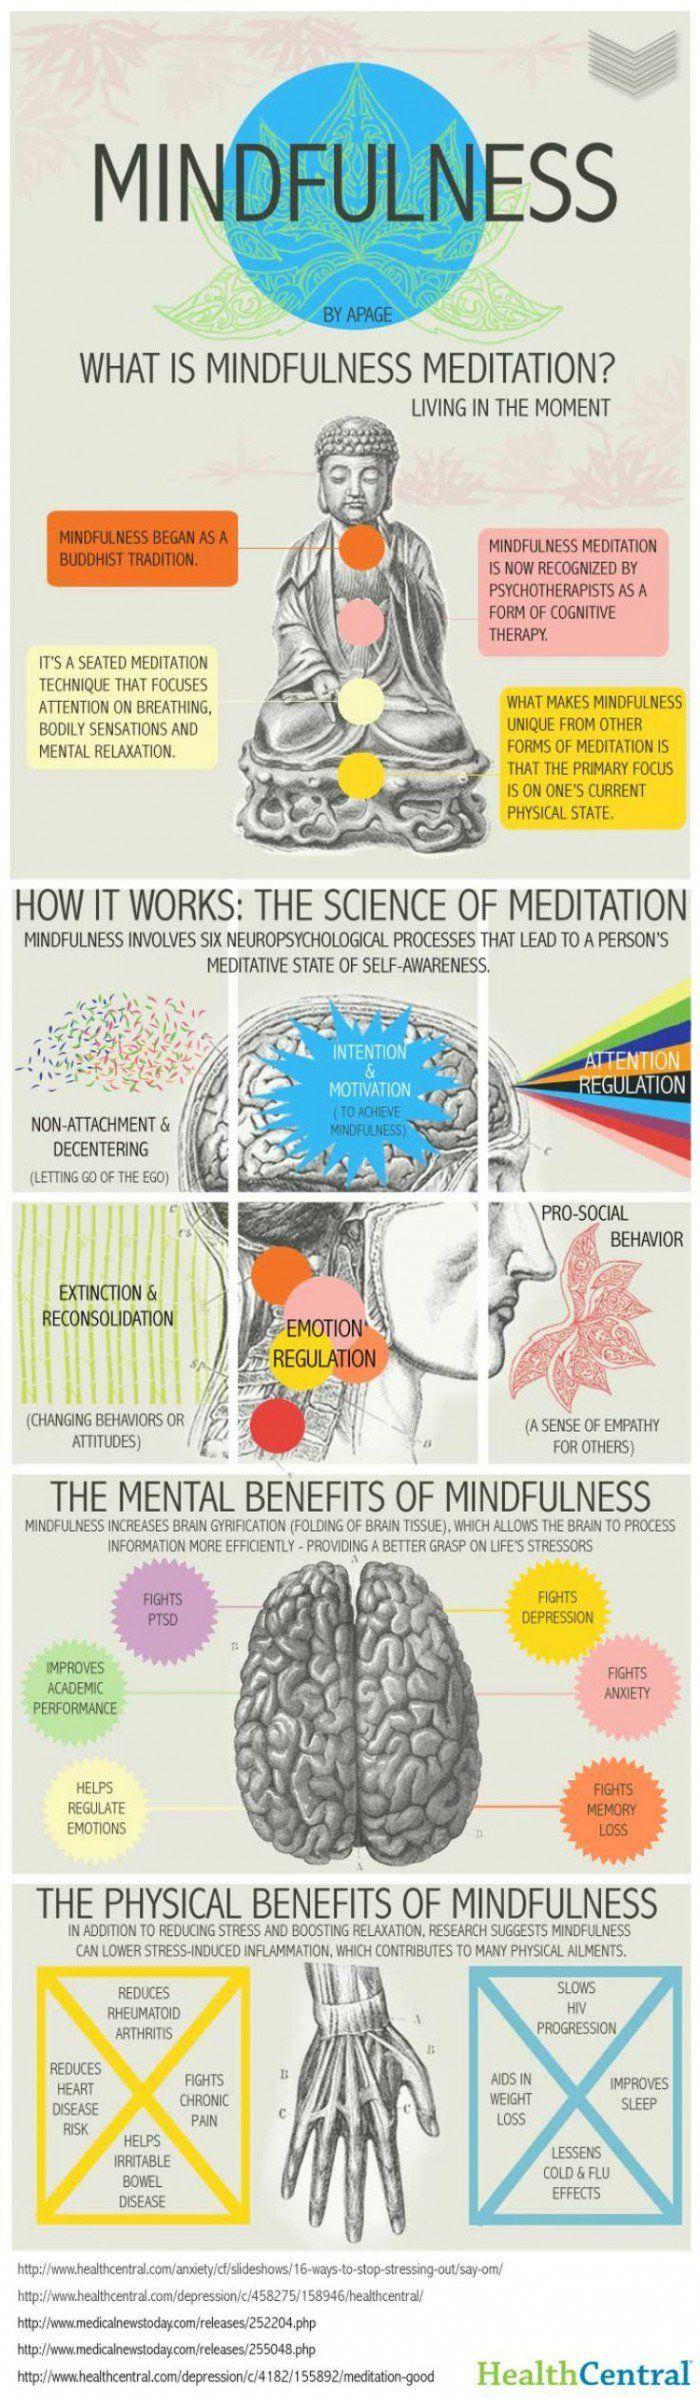 14 Benefits of Mindfulness